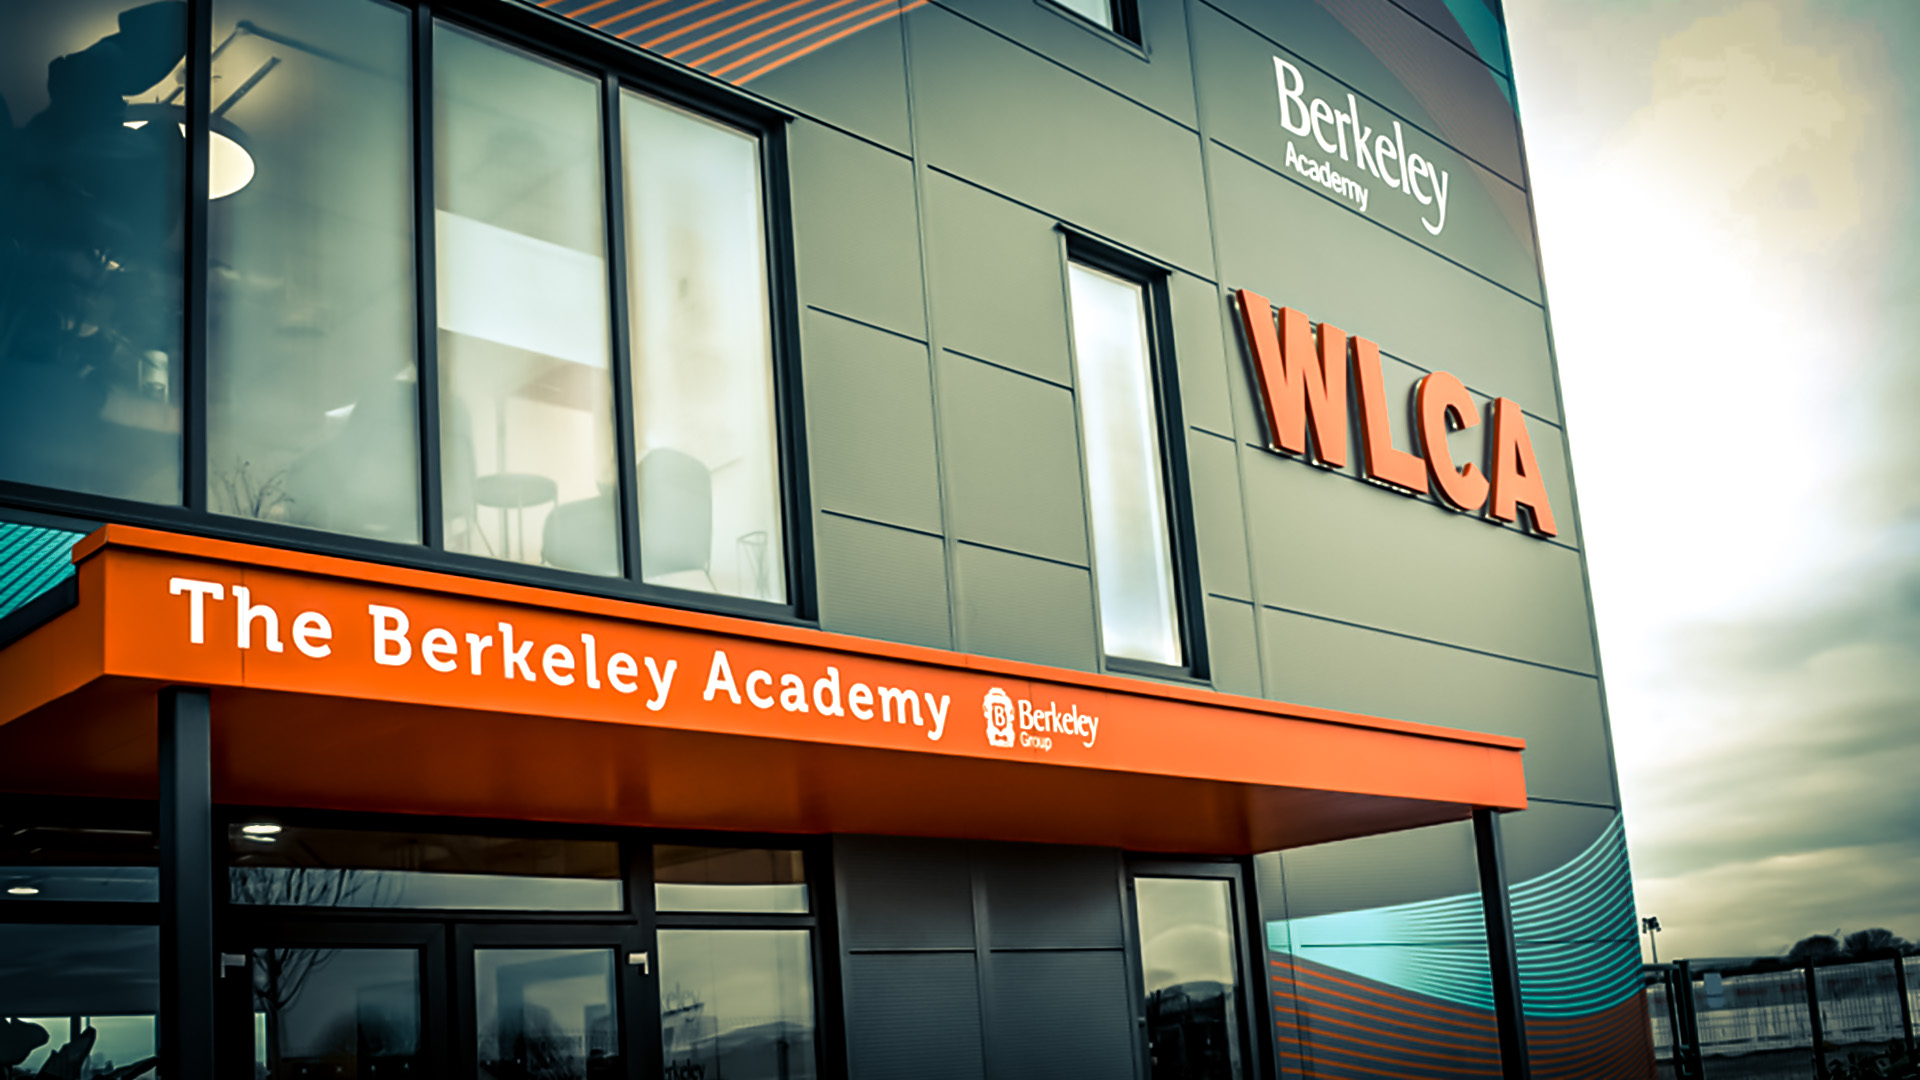 West London Construction Academy